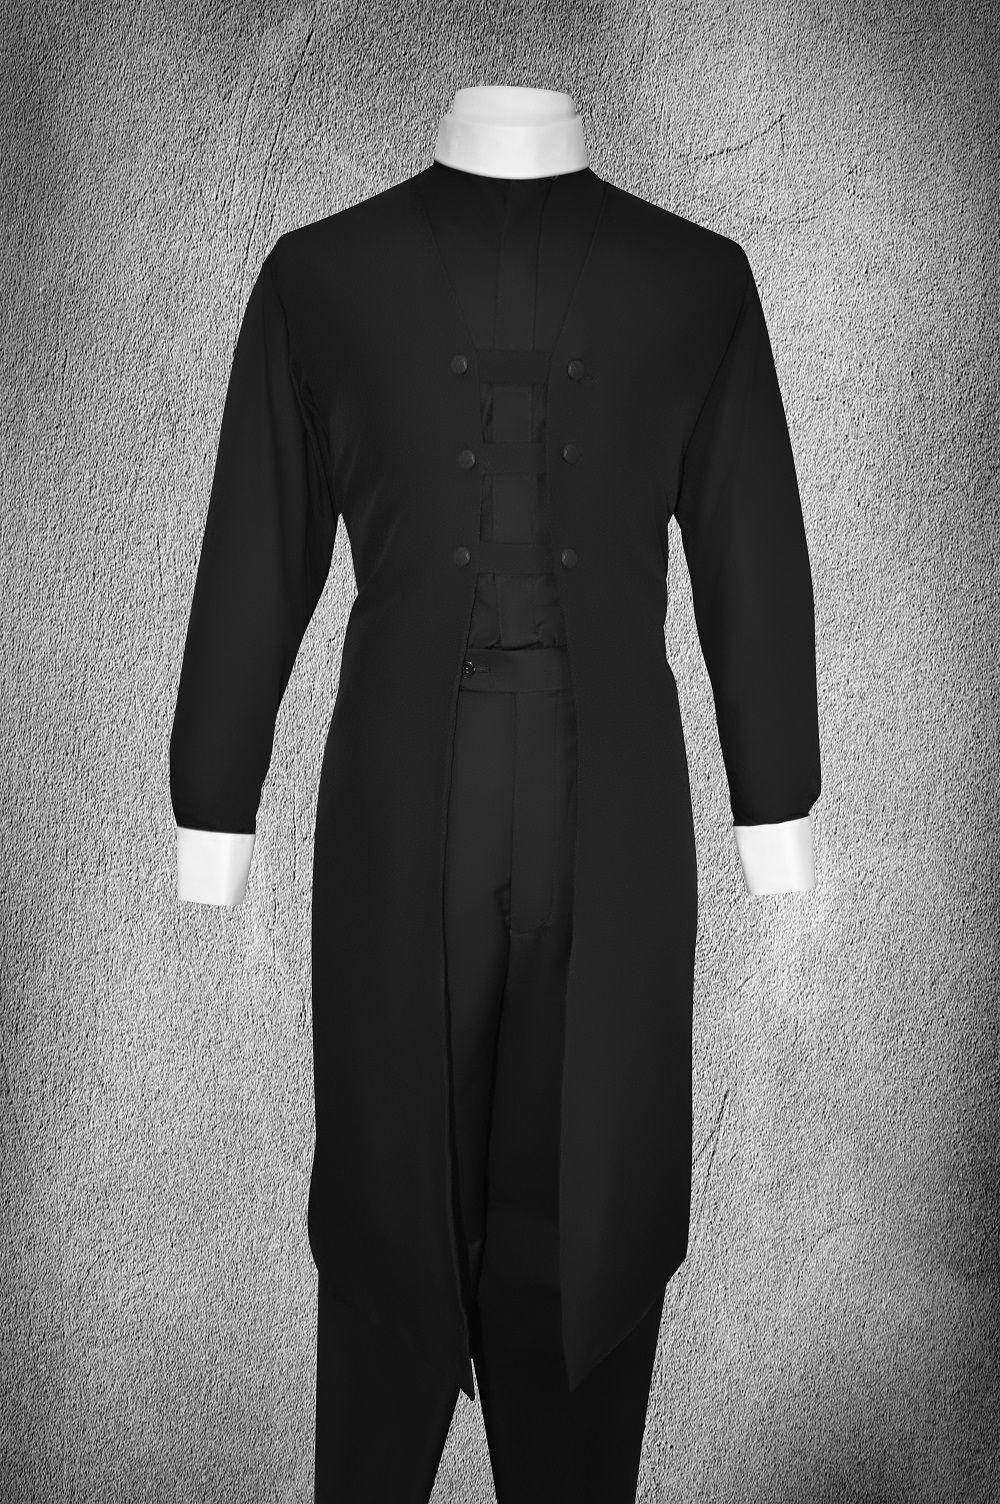 Ministerial Full Collar Vesture Set Black/Black (White Cuffs)